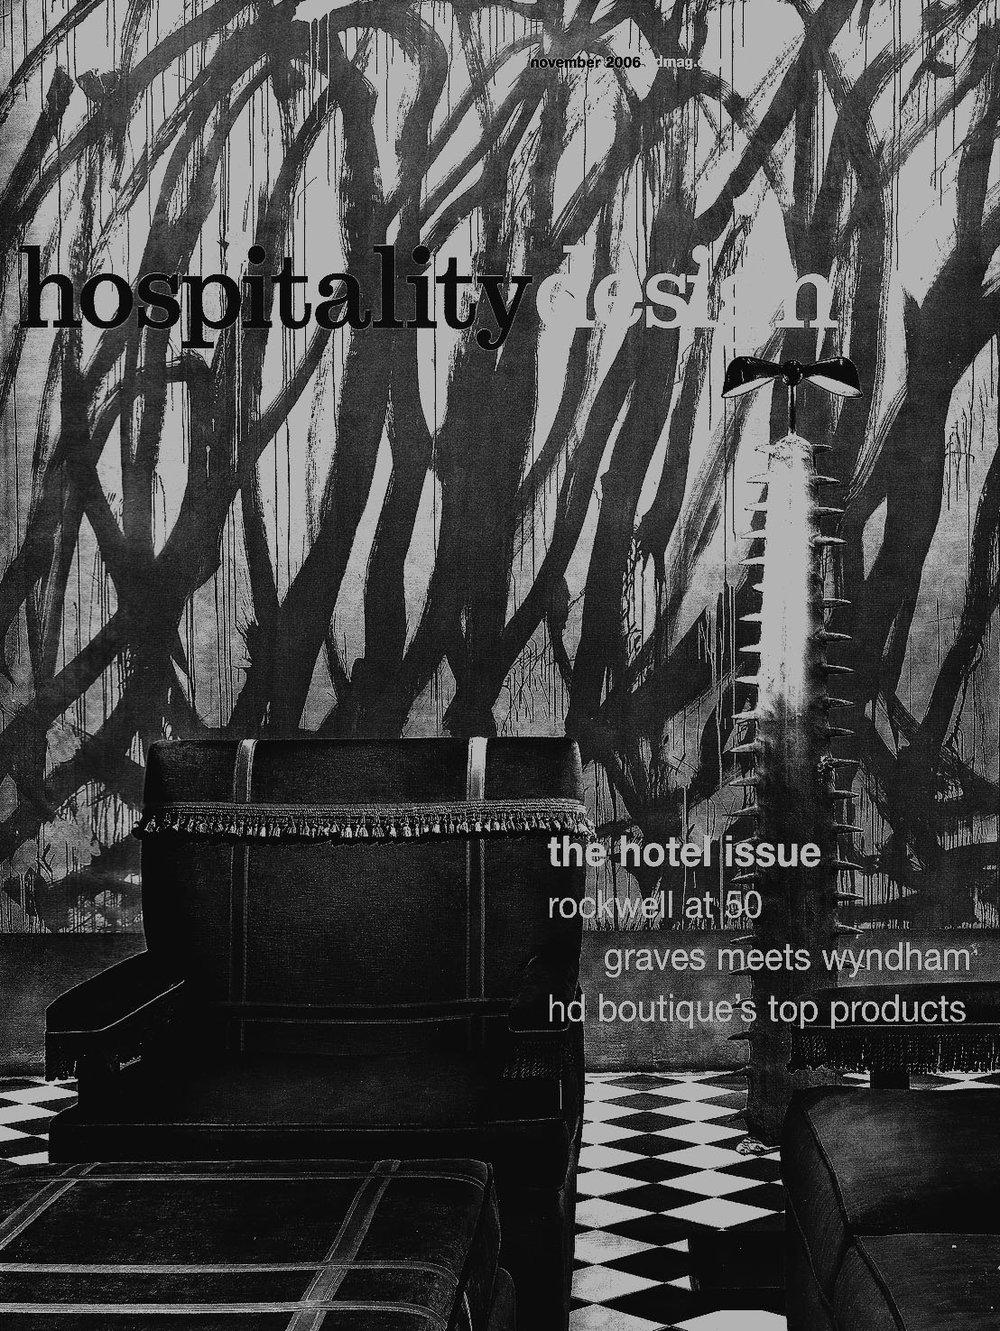 Hotel Interior Designers in New York, NY |  Joe Ginsberg Design